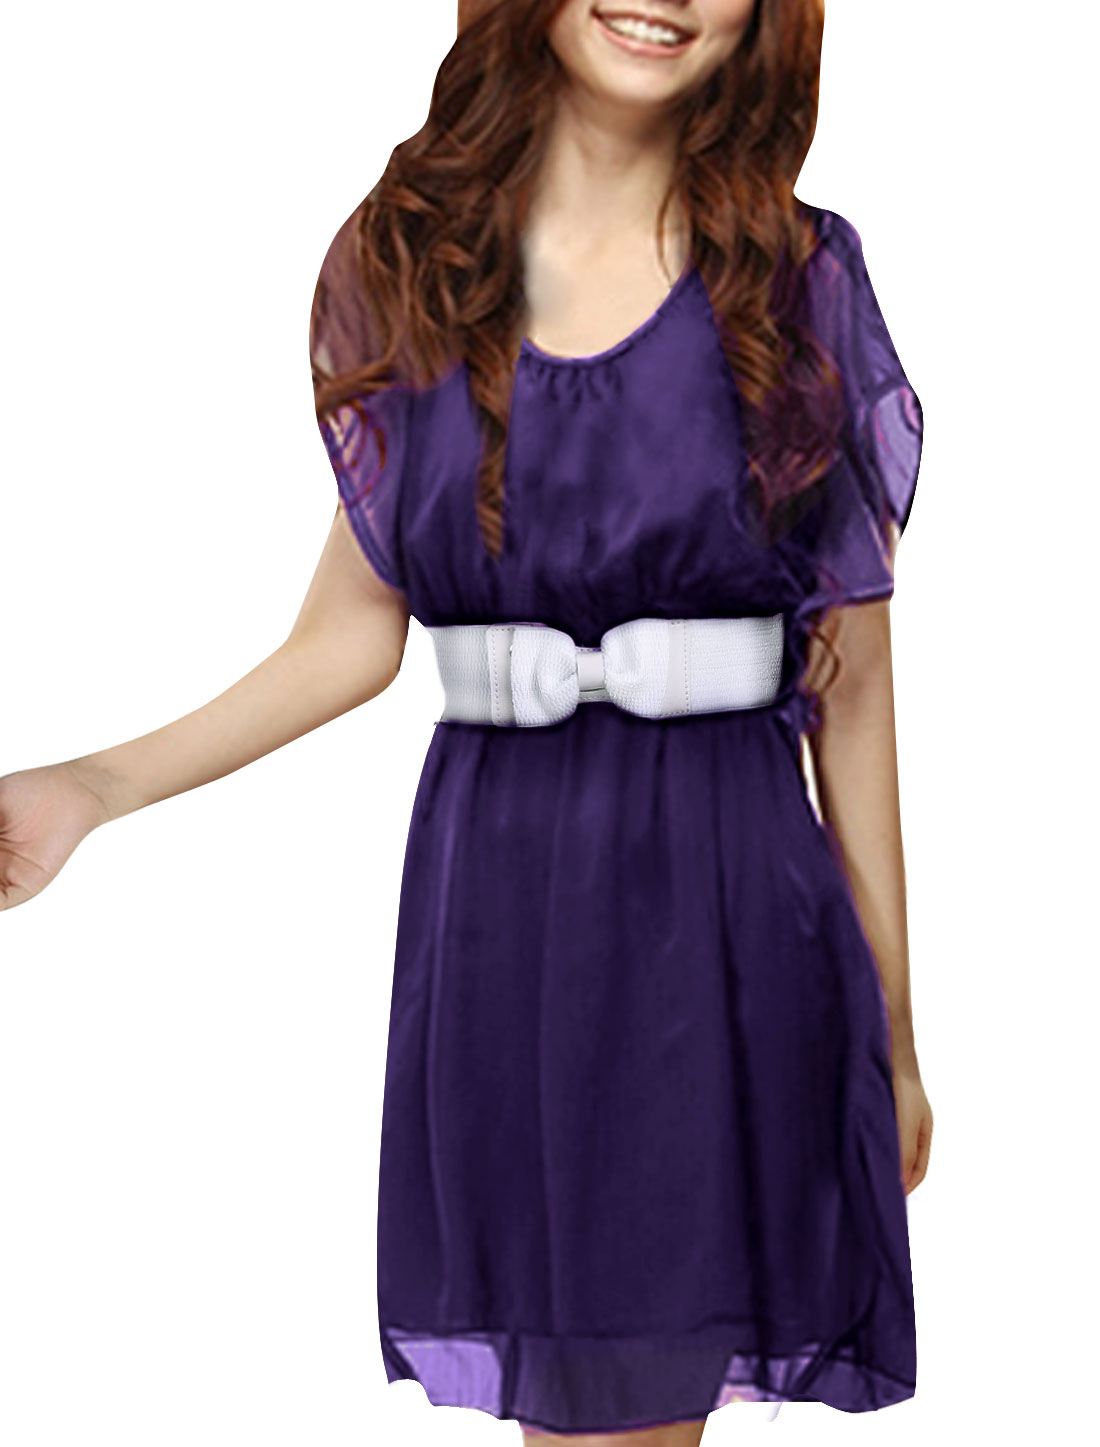 Ladies Stylish Dark Purple Lined Above Knee Dress w Bowtie Decor Belt M